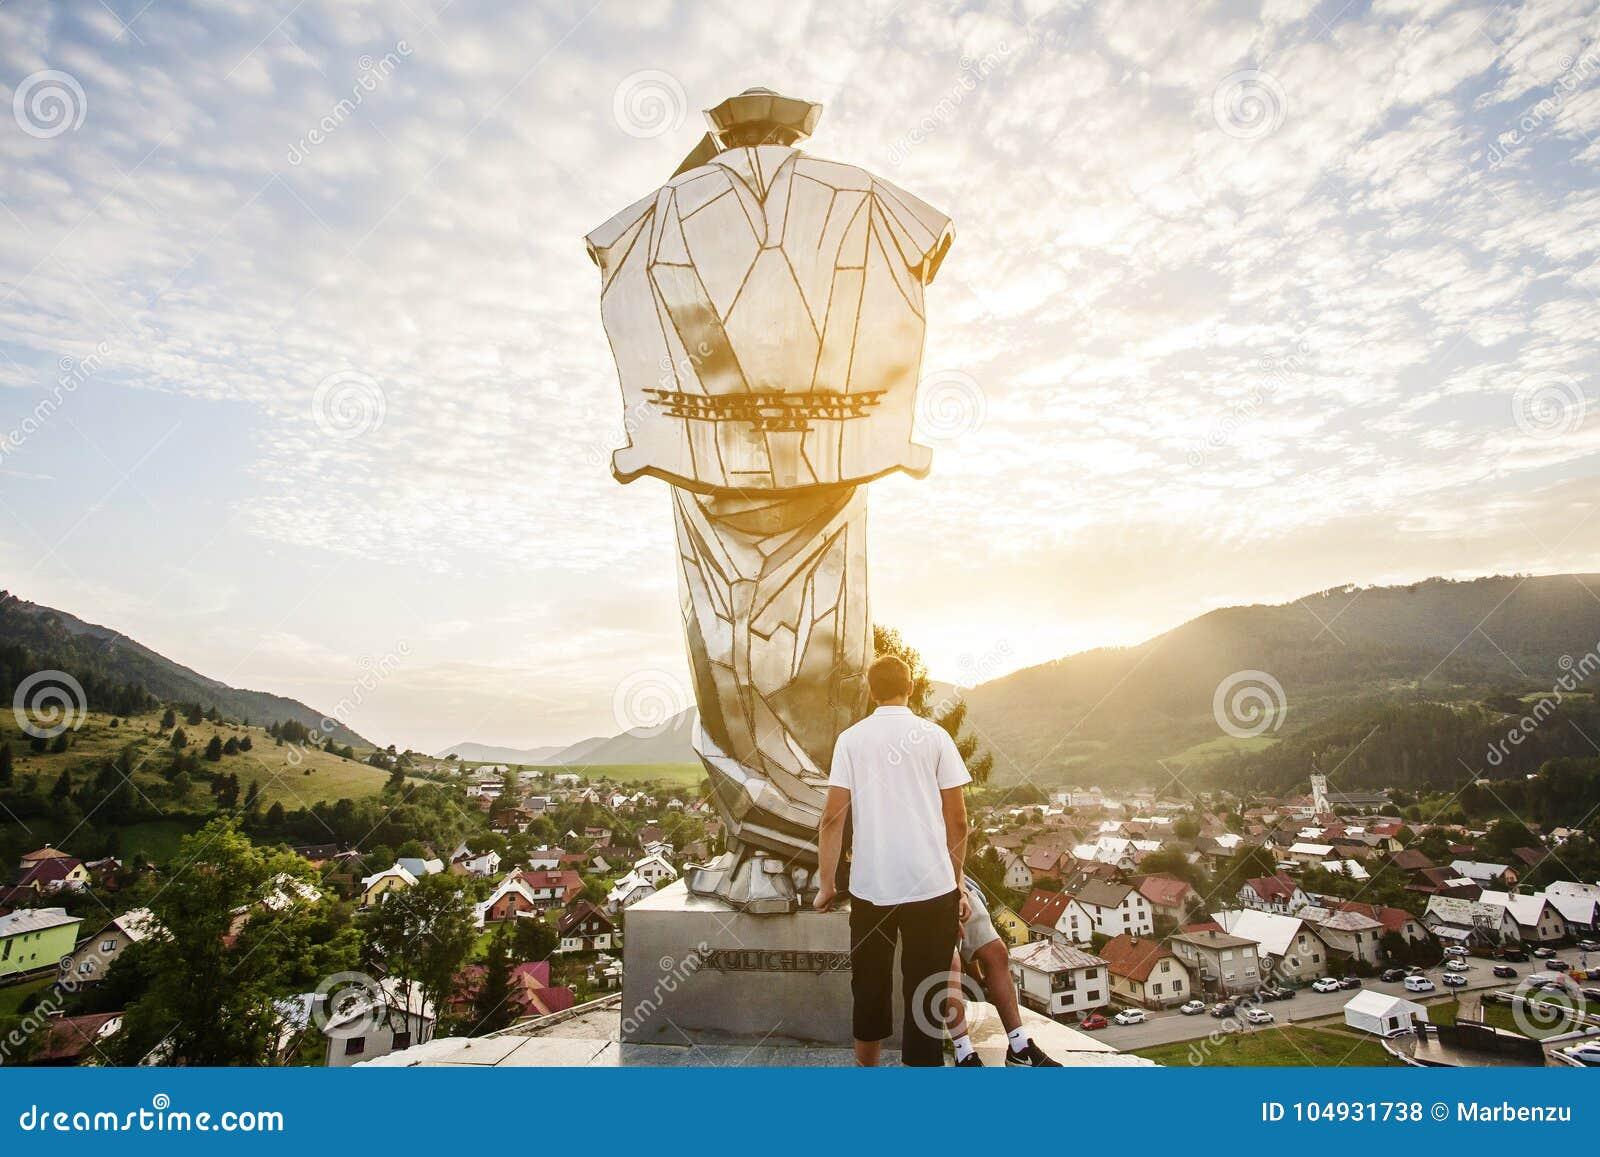 Juraj Janosik statue view, Terchova city